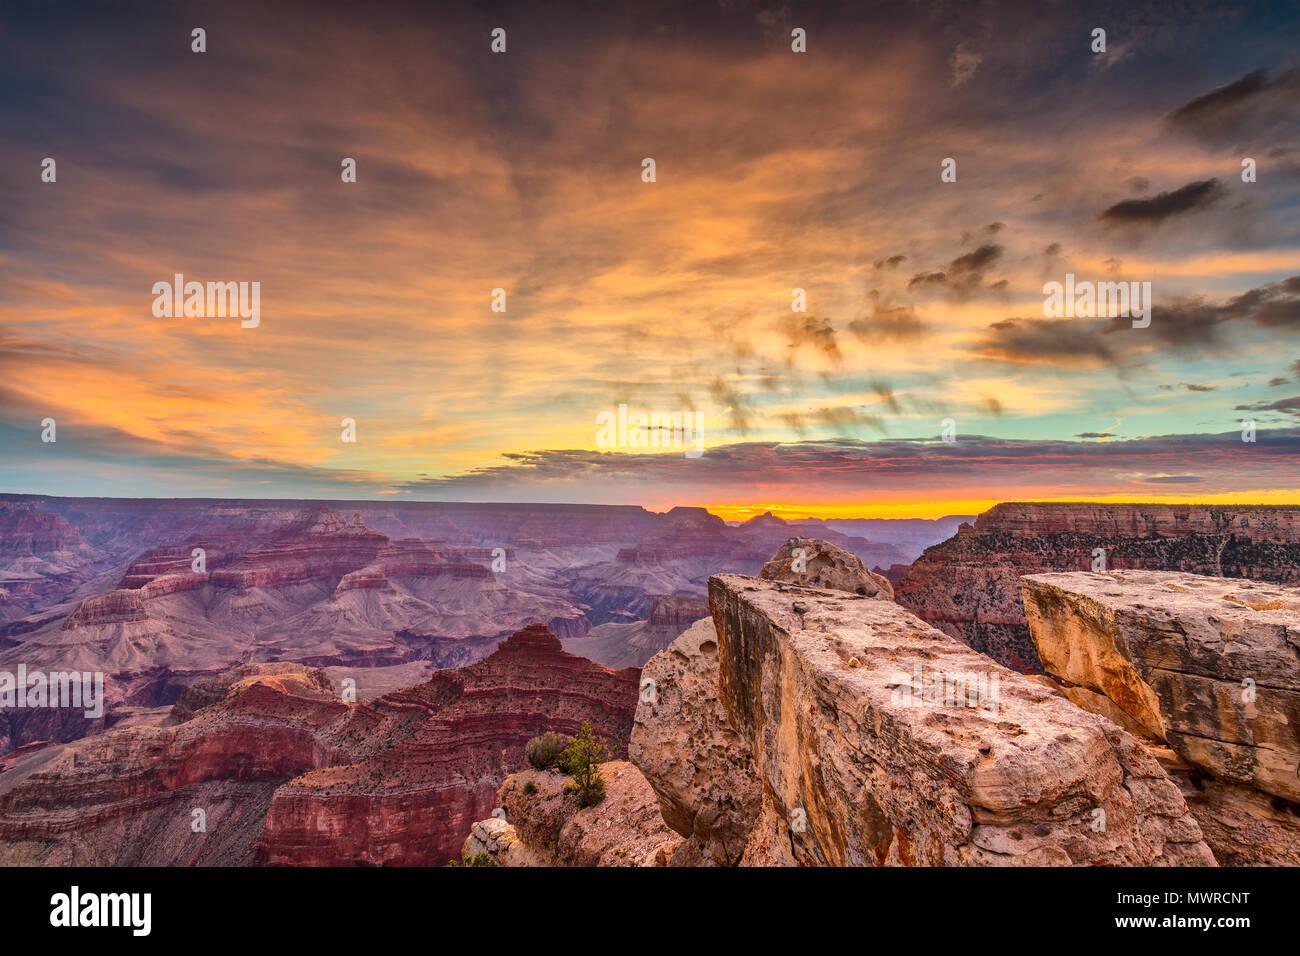 Grand Canyon, Arizona, USA at dawn from the south rim. - Stock Image